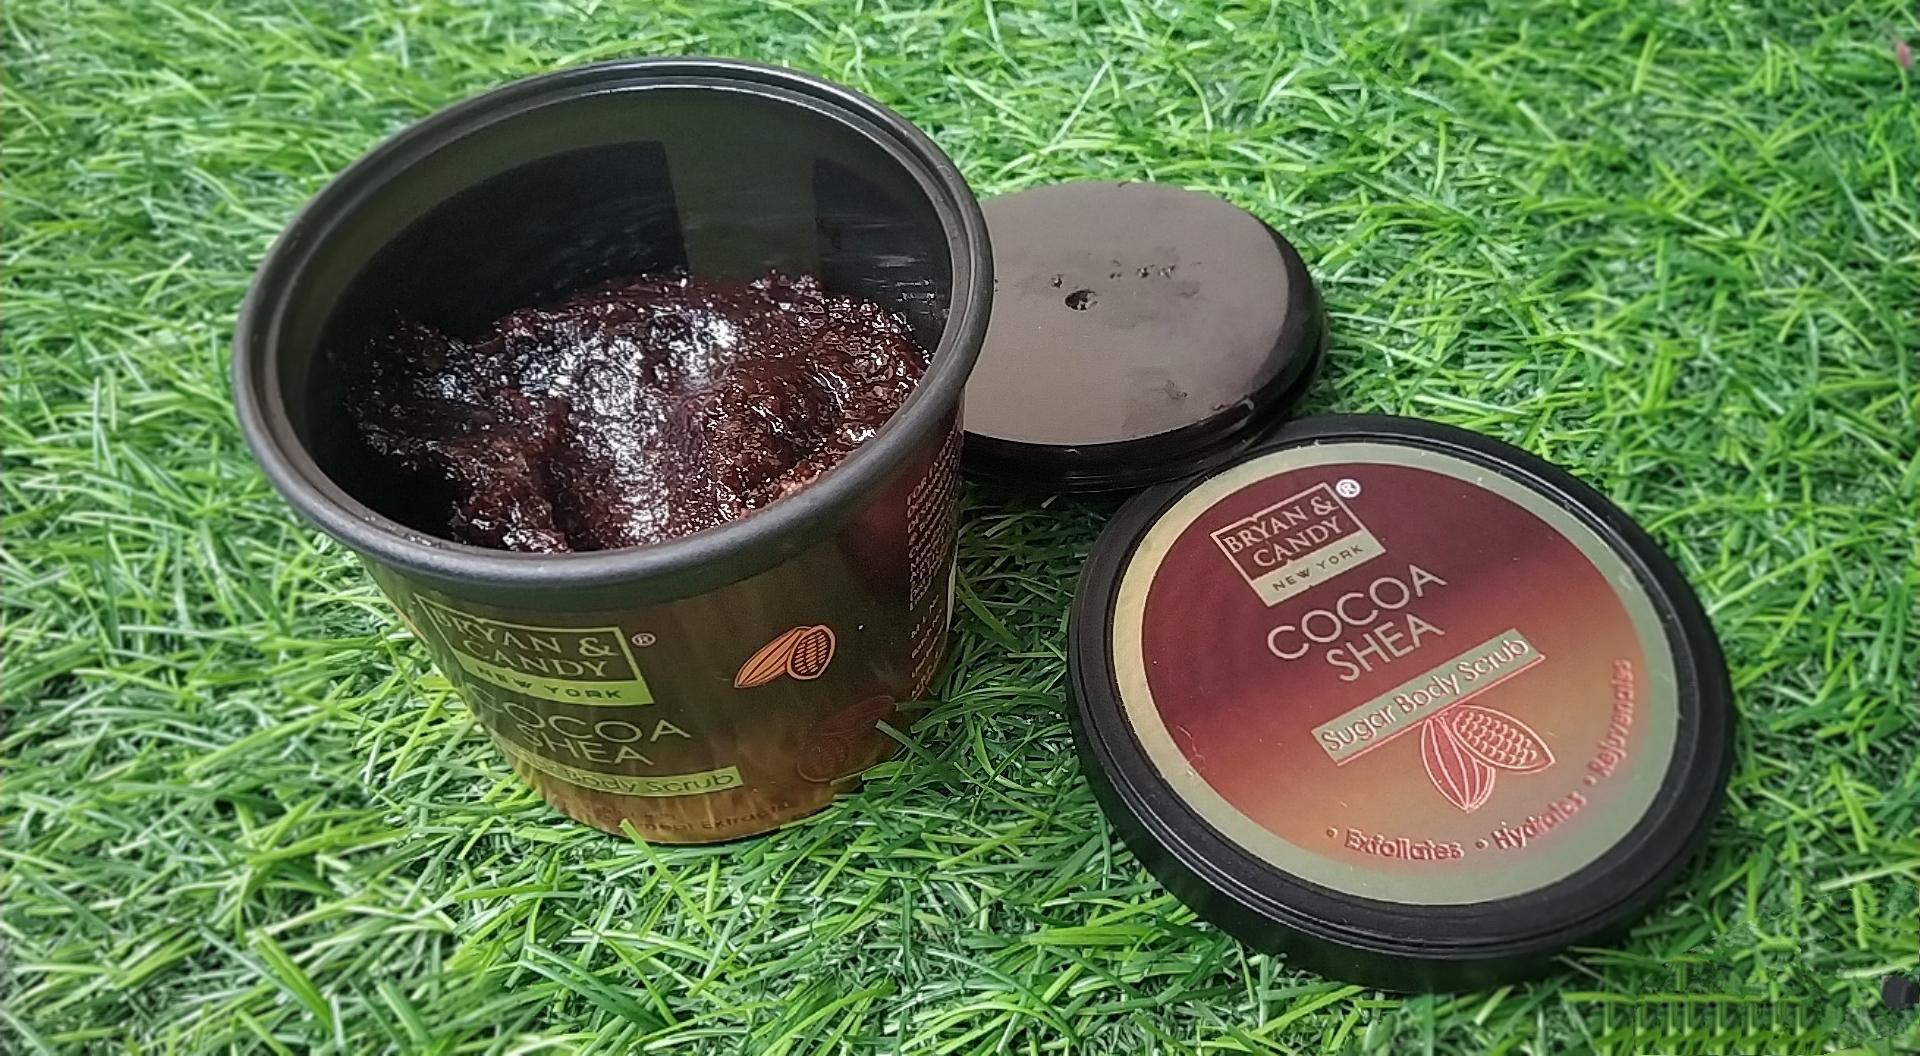 Bryan & Candy New York Cocoa Shea Sugar Body Scrub-Cocoa sugar scrub with healing aroma-By priyanka_ojha-3